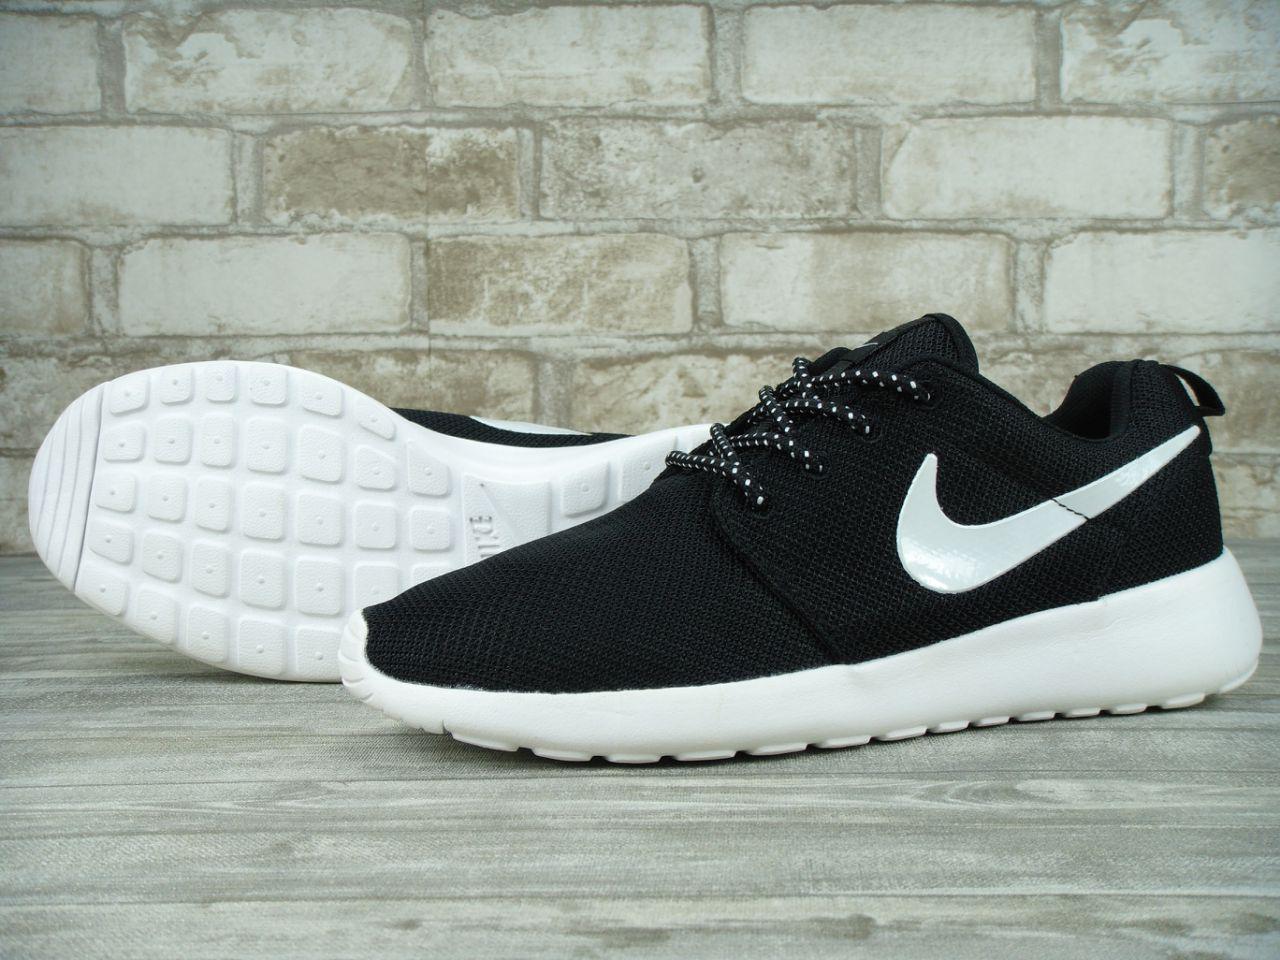 b1e17d96 Кроссовки женские Nike Roshe Run KD-10608. Черные - SNKRS ONE  ИНТЕРНЕТ-МАГАЗИН